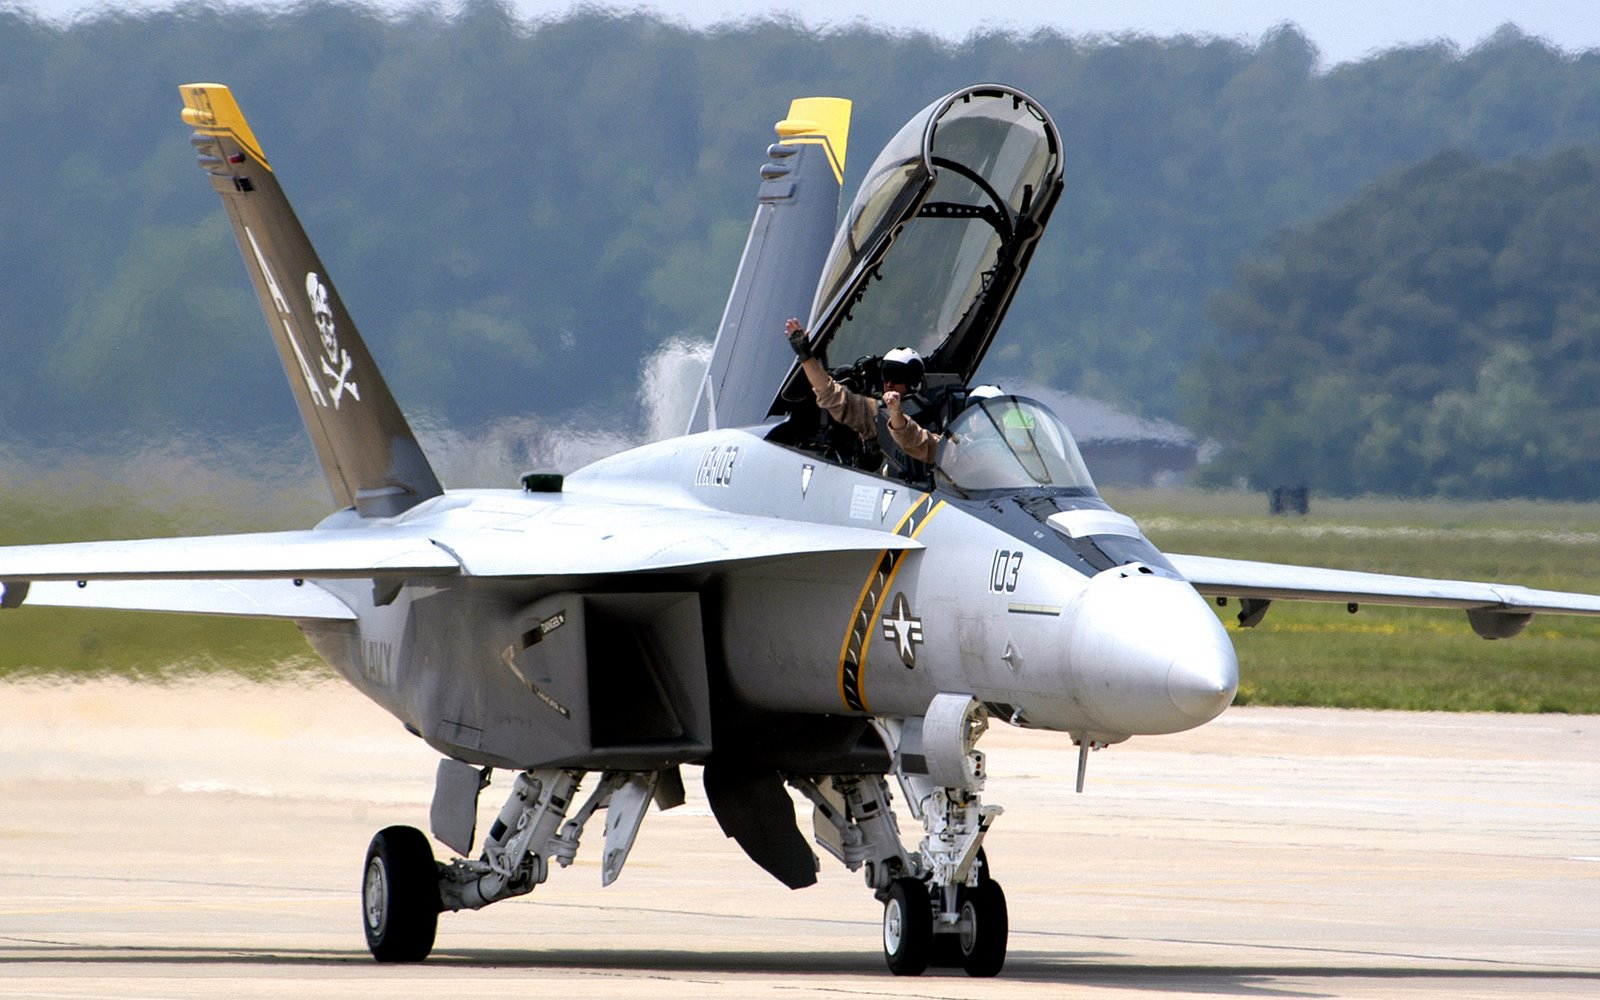 Free Download Jet Airline F 18 Super Hornet Wallpaper 1600x1000